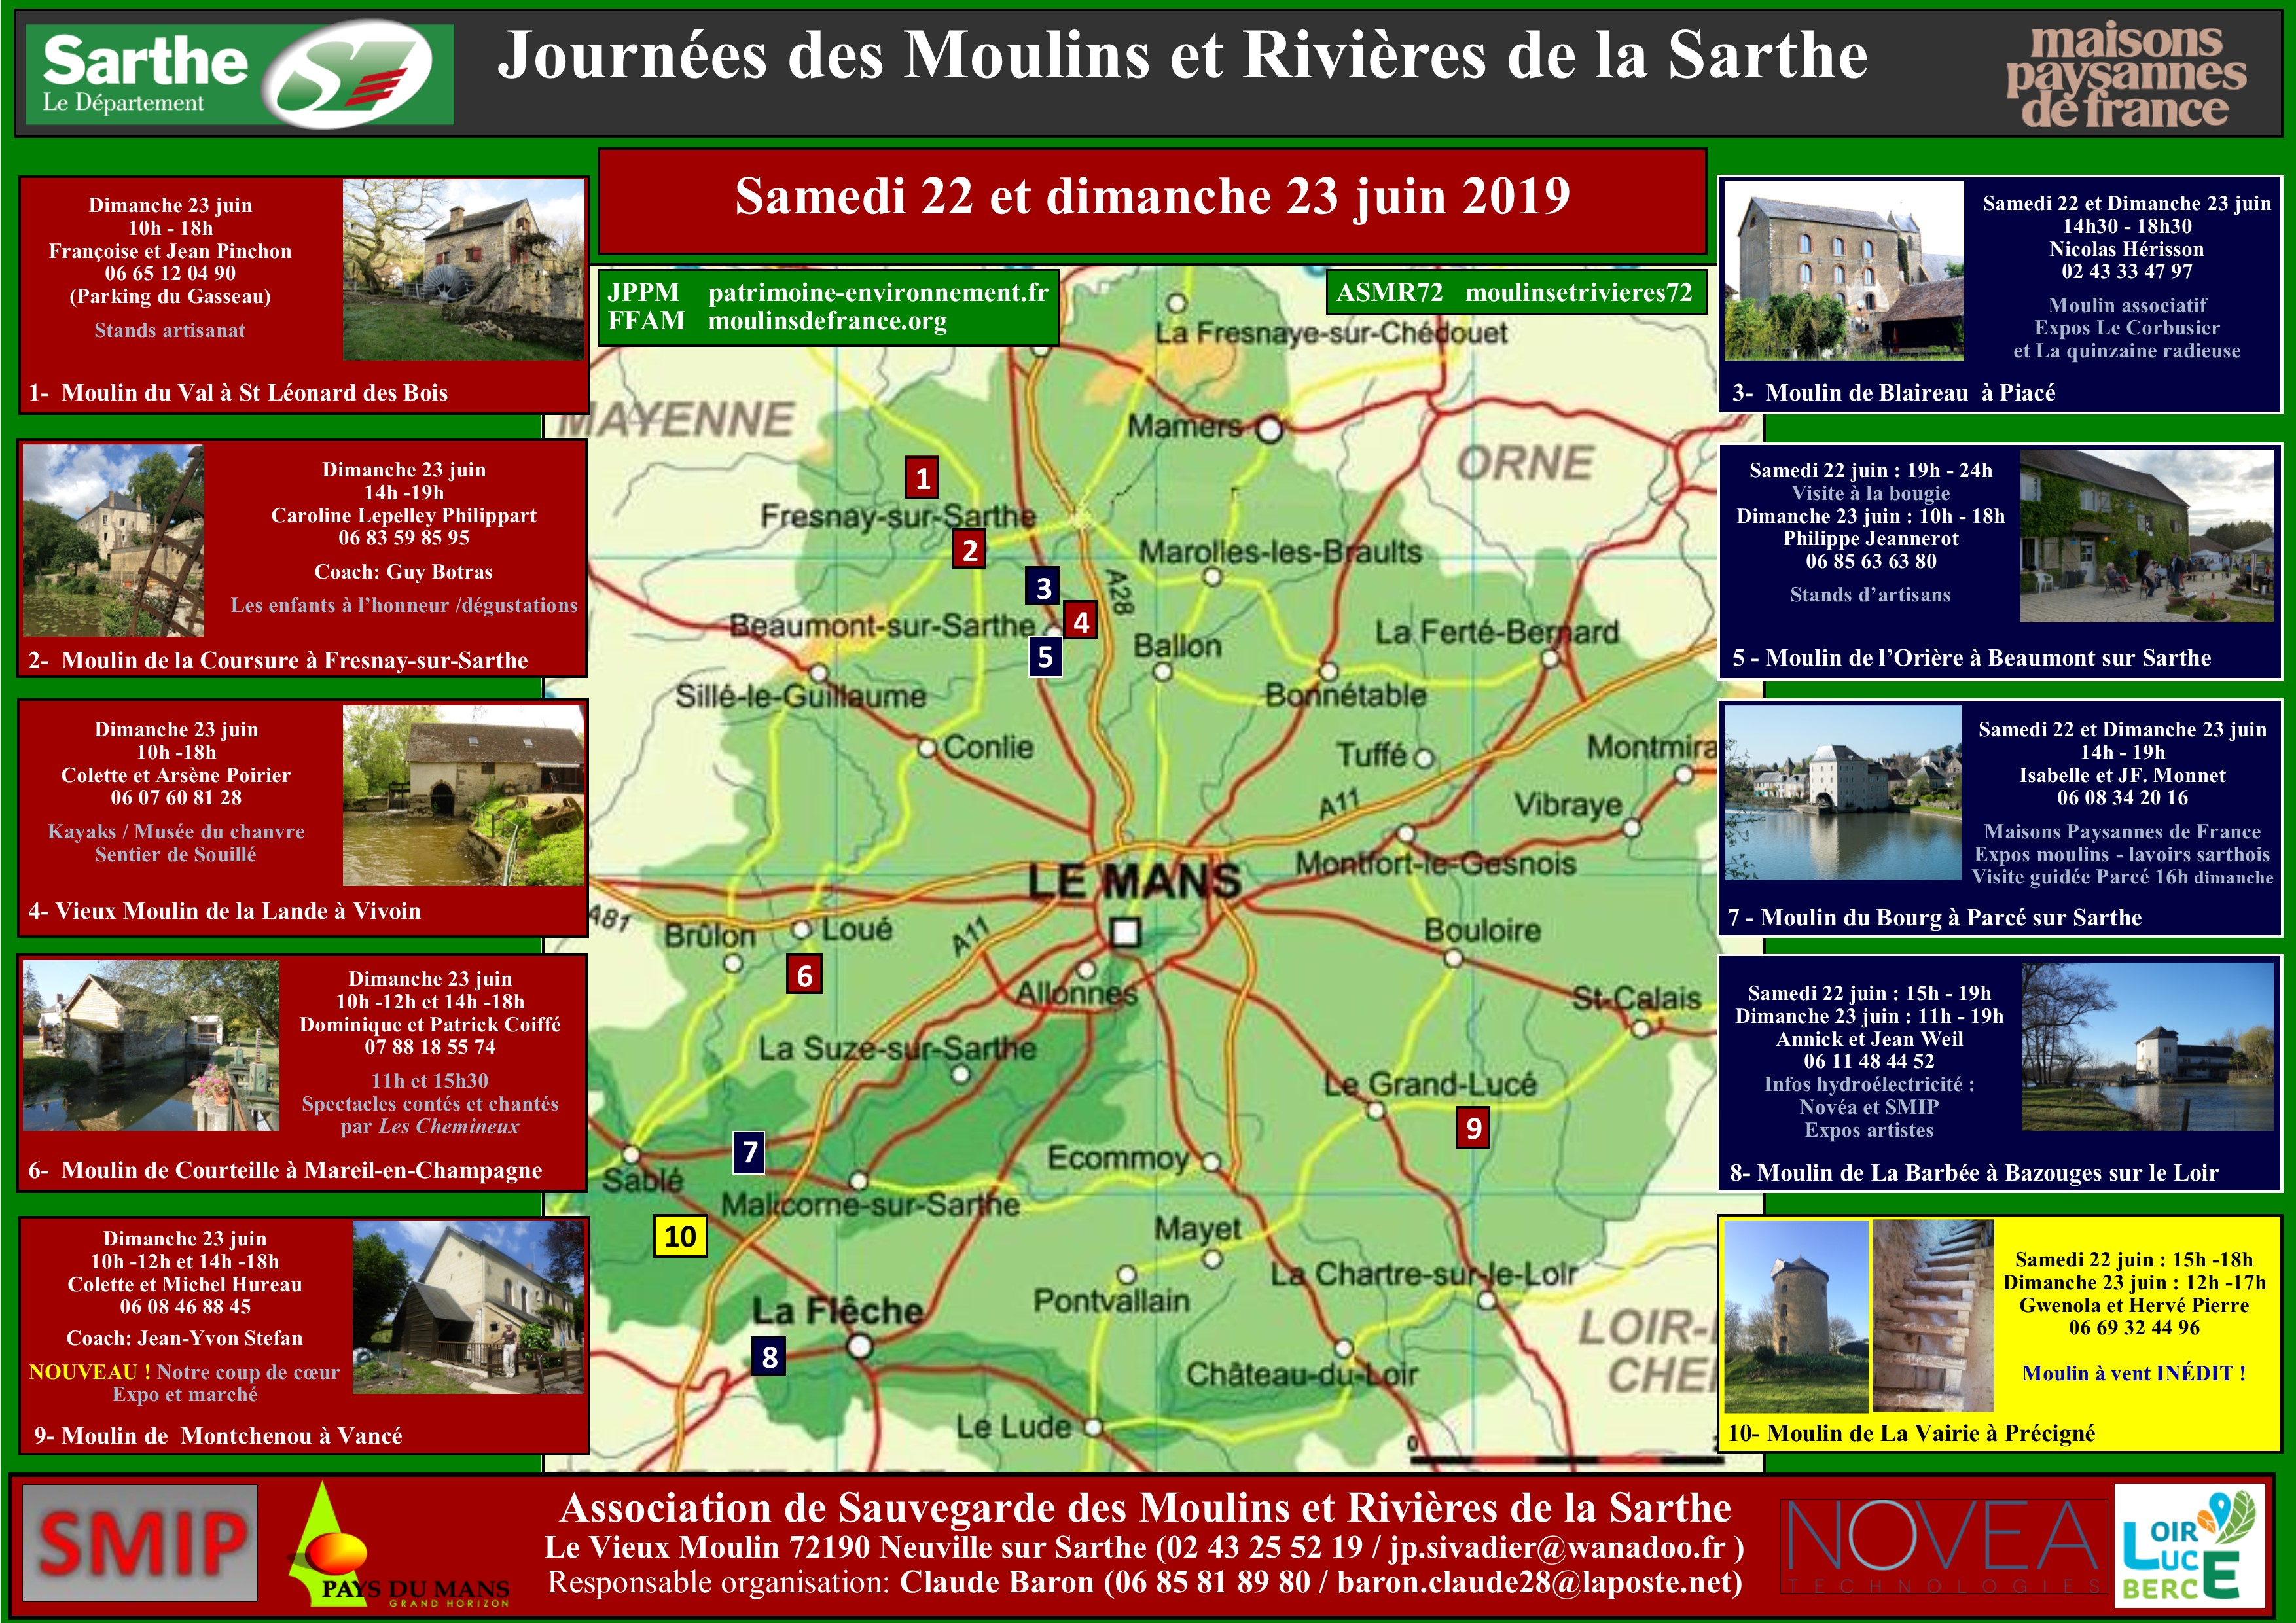 Affiche Journées des Moulins ASMR72 - 2019